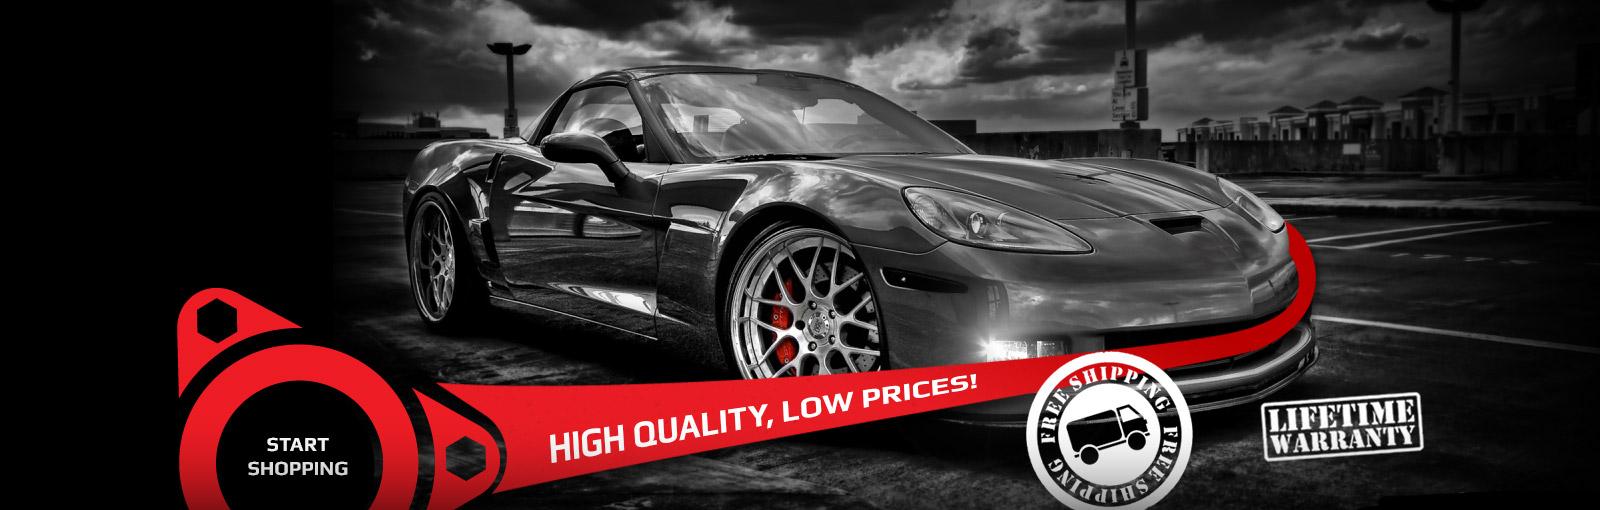 Front Wheel Bearing Suzuki Esteem Baleno 95-02 510018 Lifetime Warranty